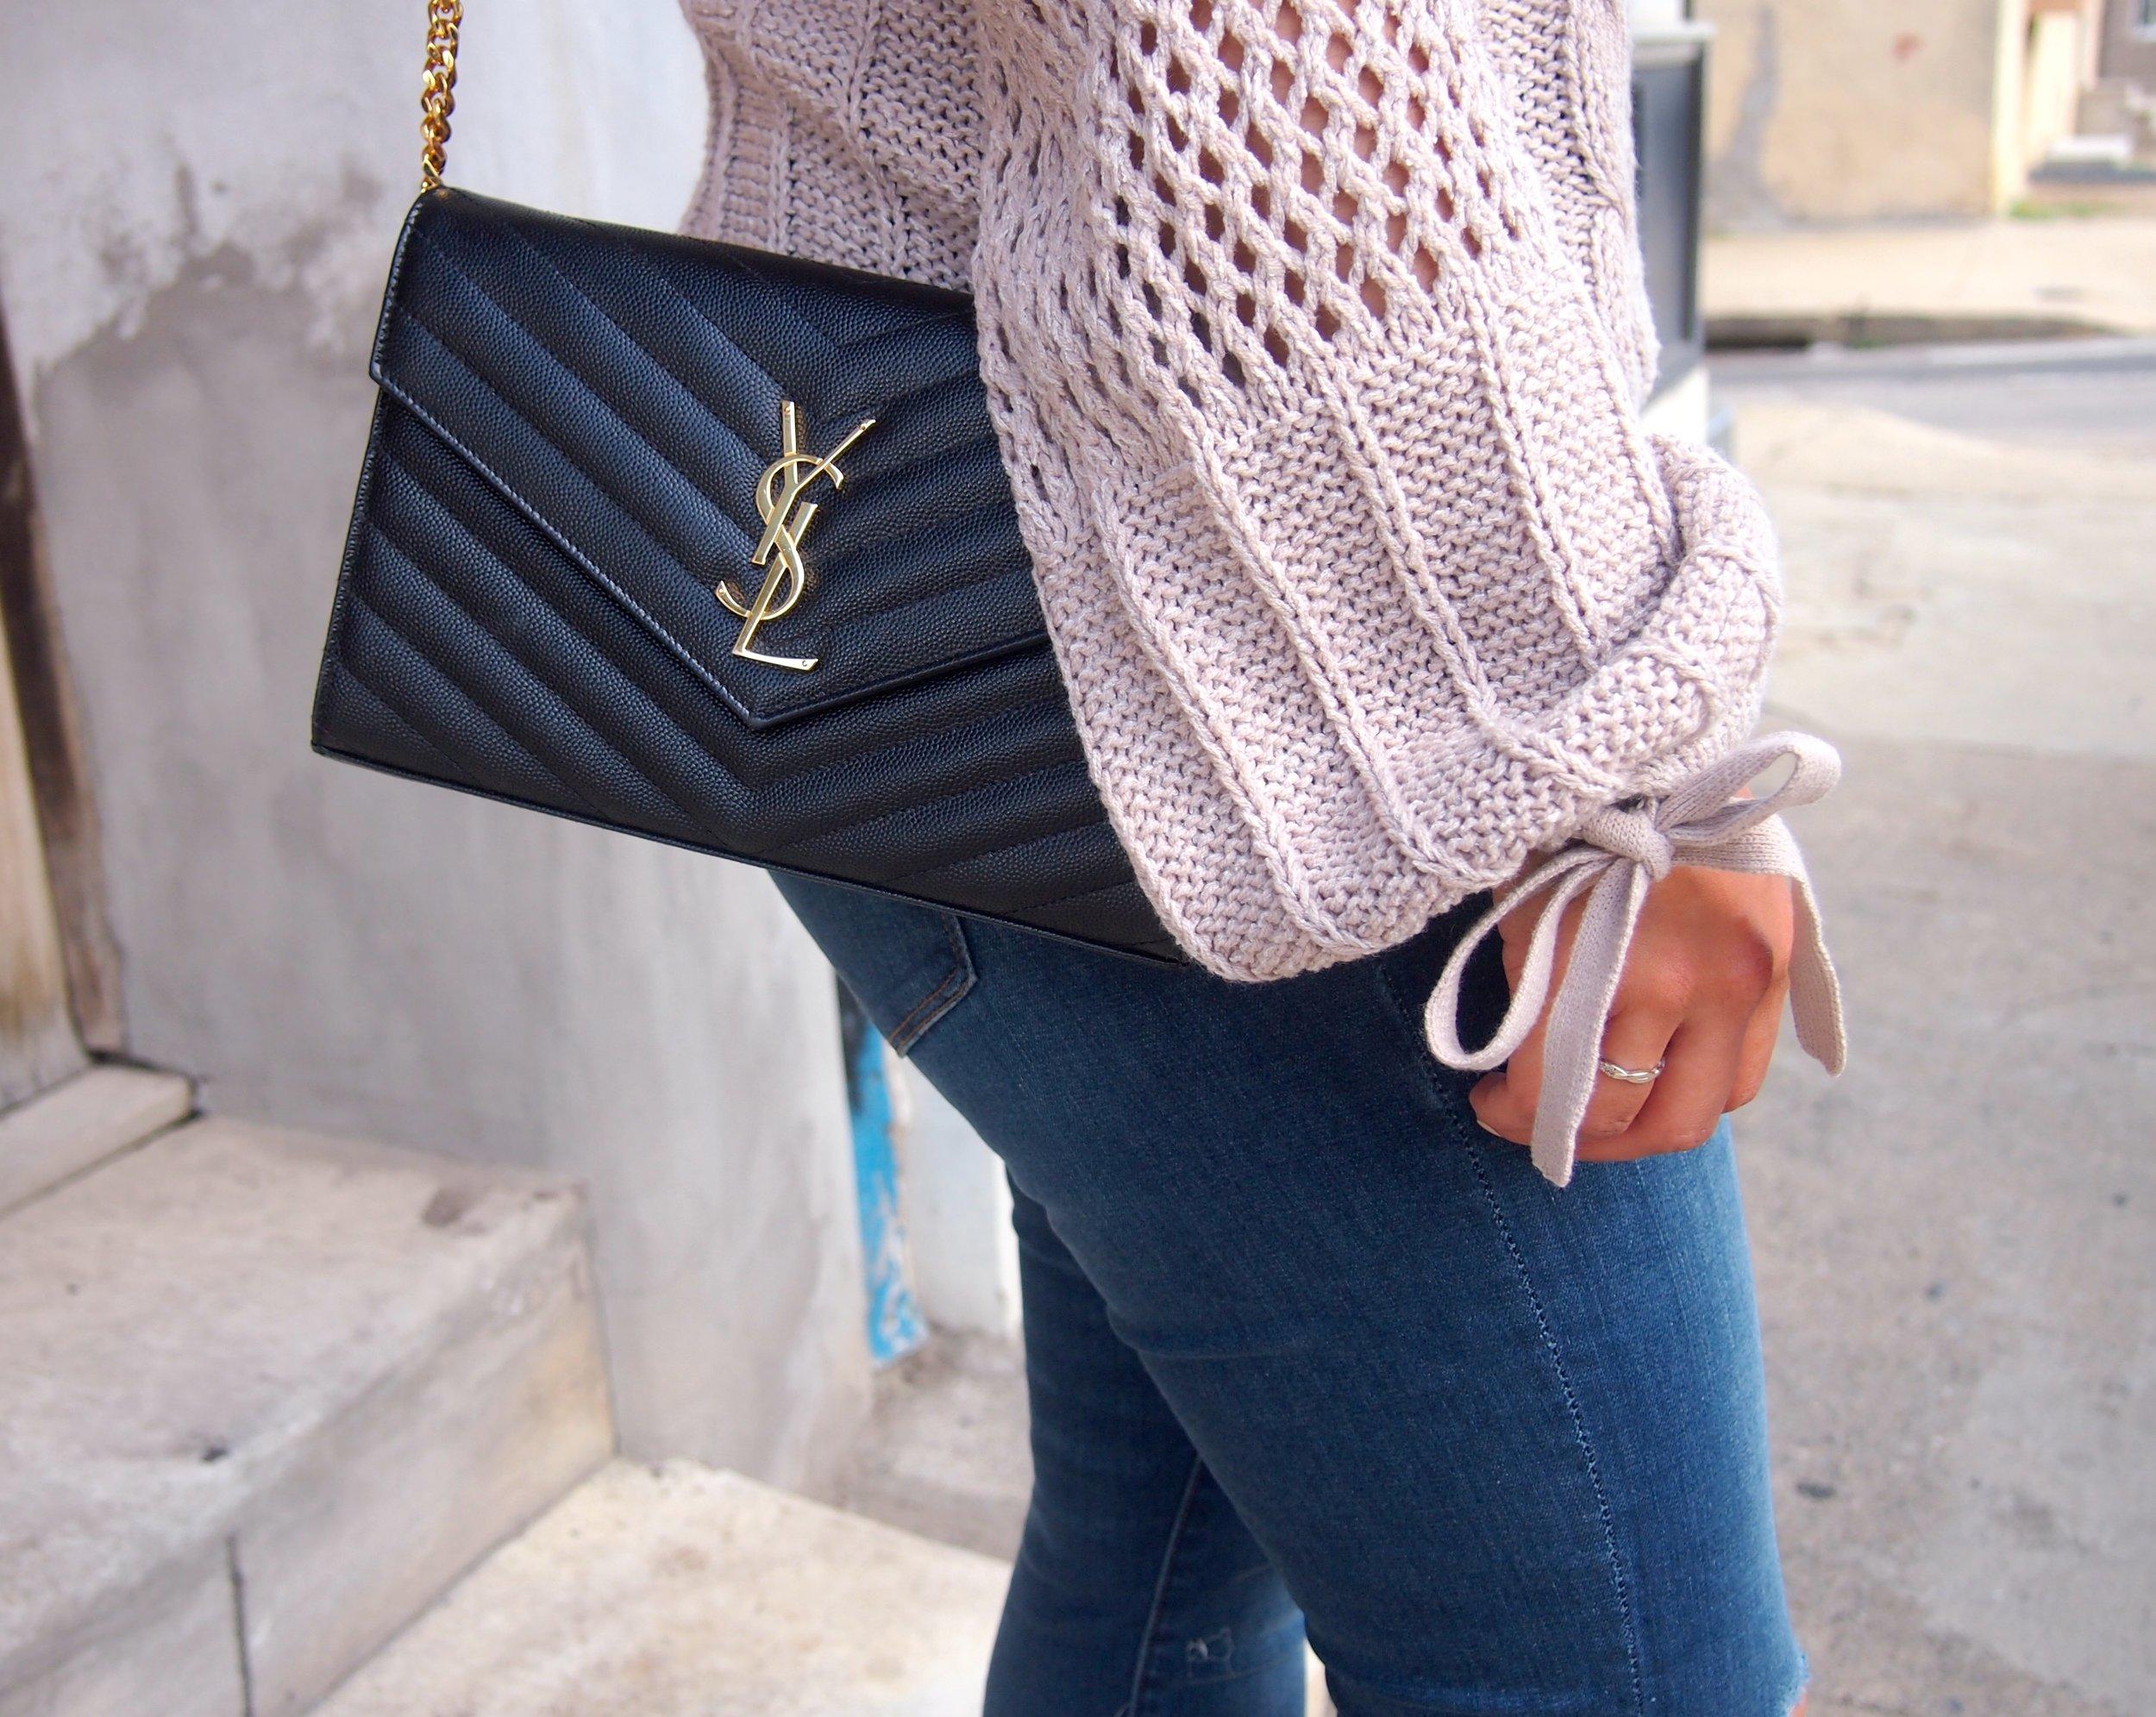 saint-laurent-handbag-philadelphia.JPG